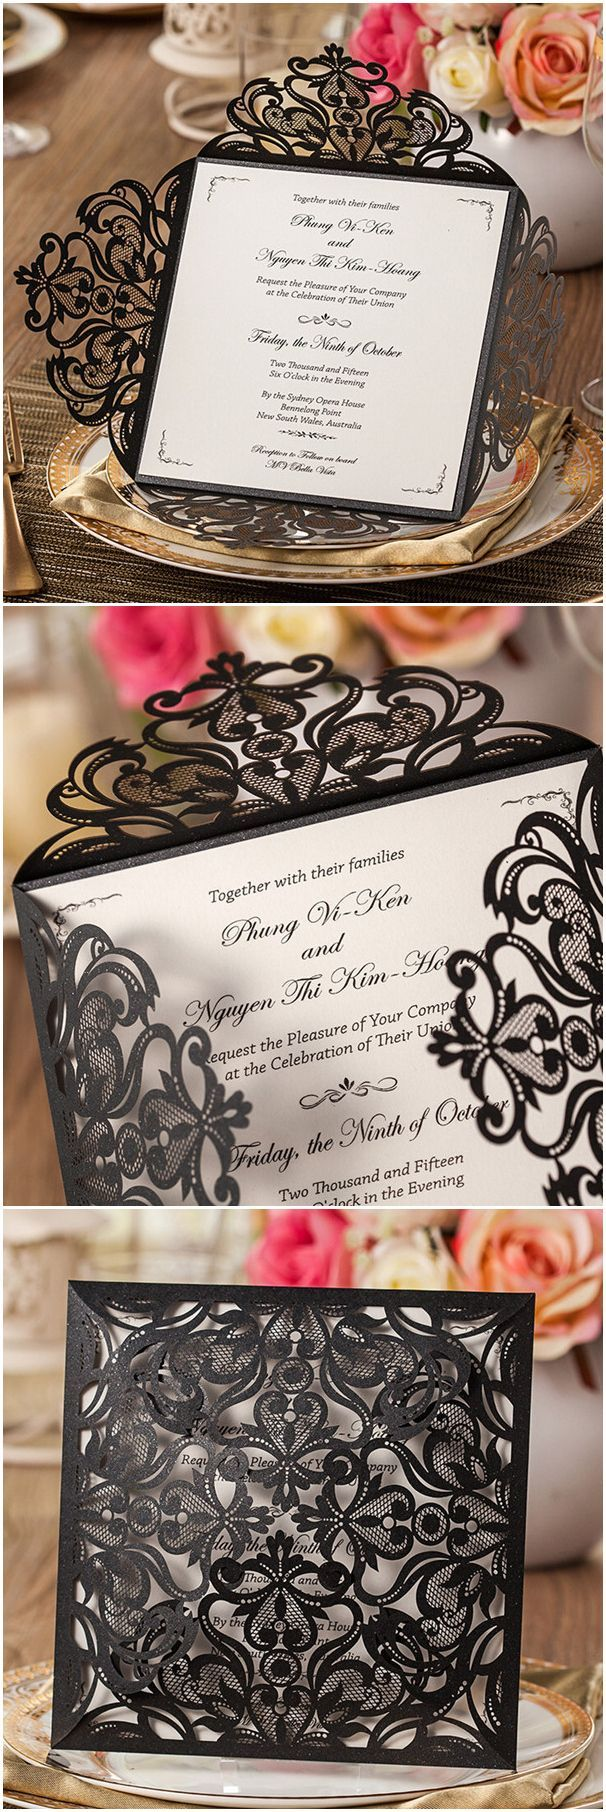 45 best Wedding Invitations images on Pinterest | Invitations ...